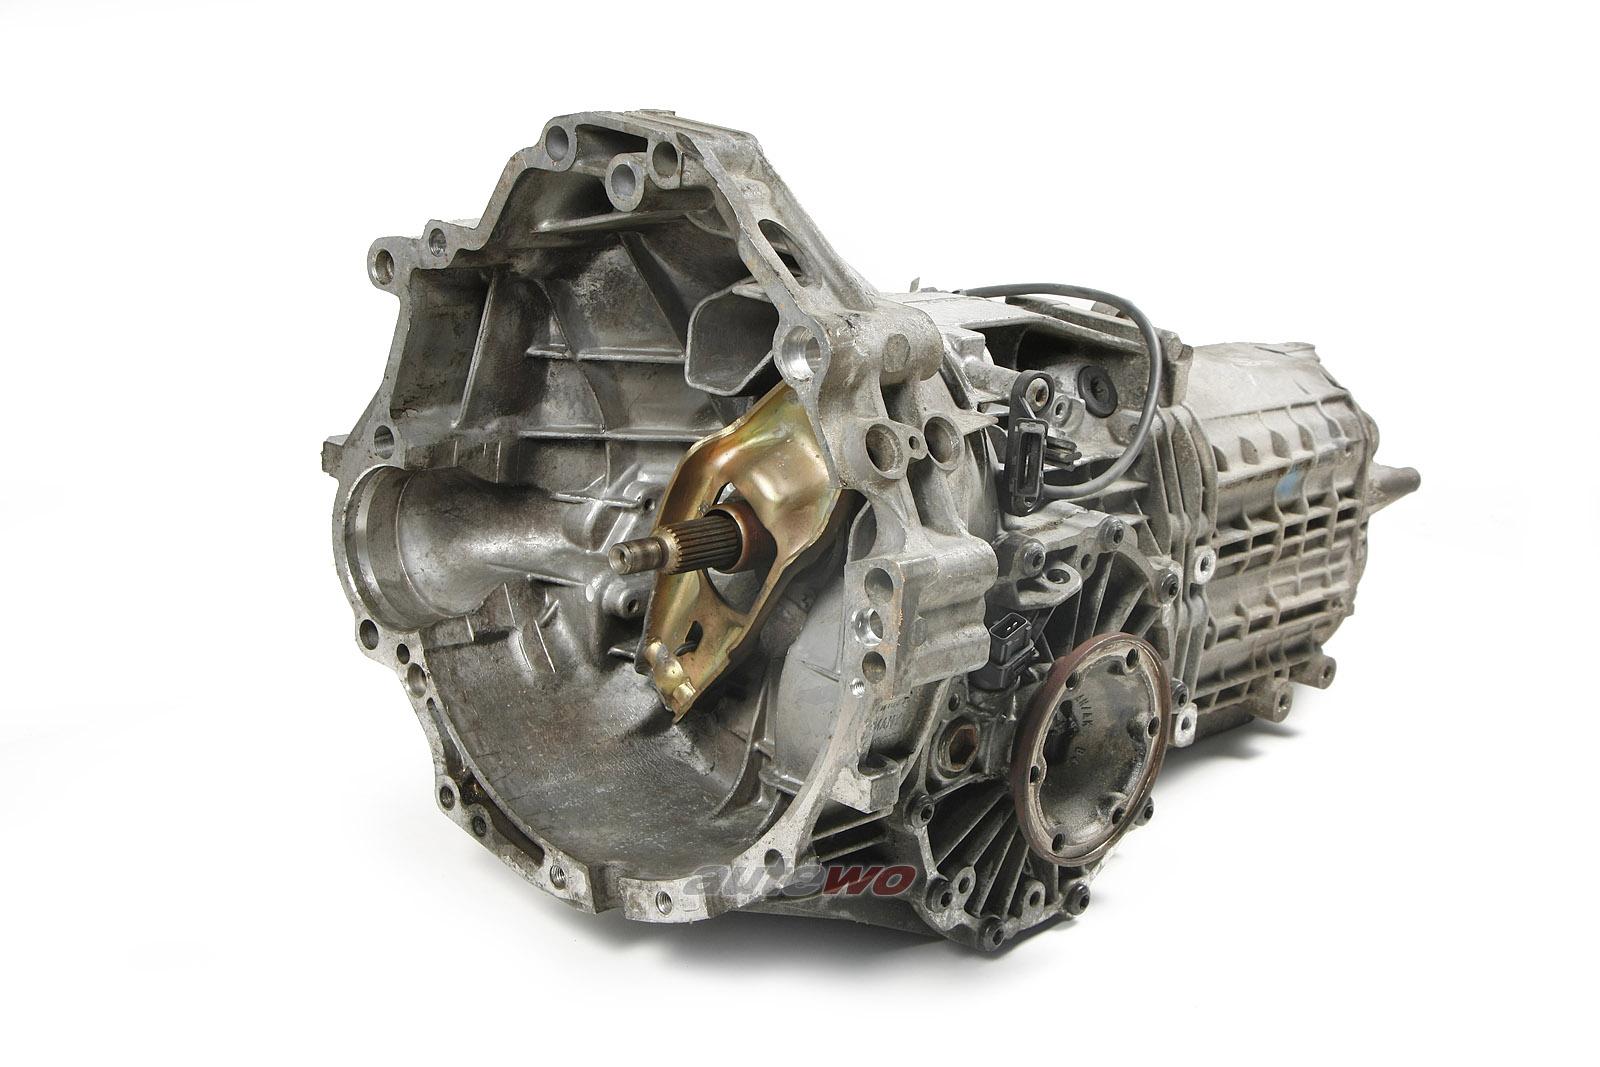 012300054KX Audi 80 Typ 89 Cabrio/A4 B5/A6 4B 1.8l Schaltgetriebe DWA 22090